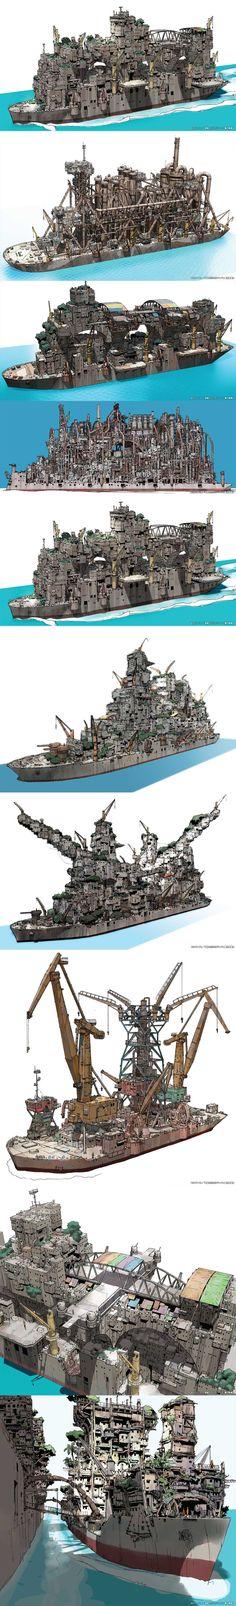 "Ships from ""Gargantia on the Verdurous Planet"""